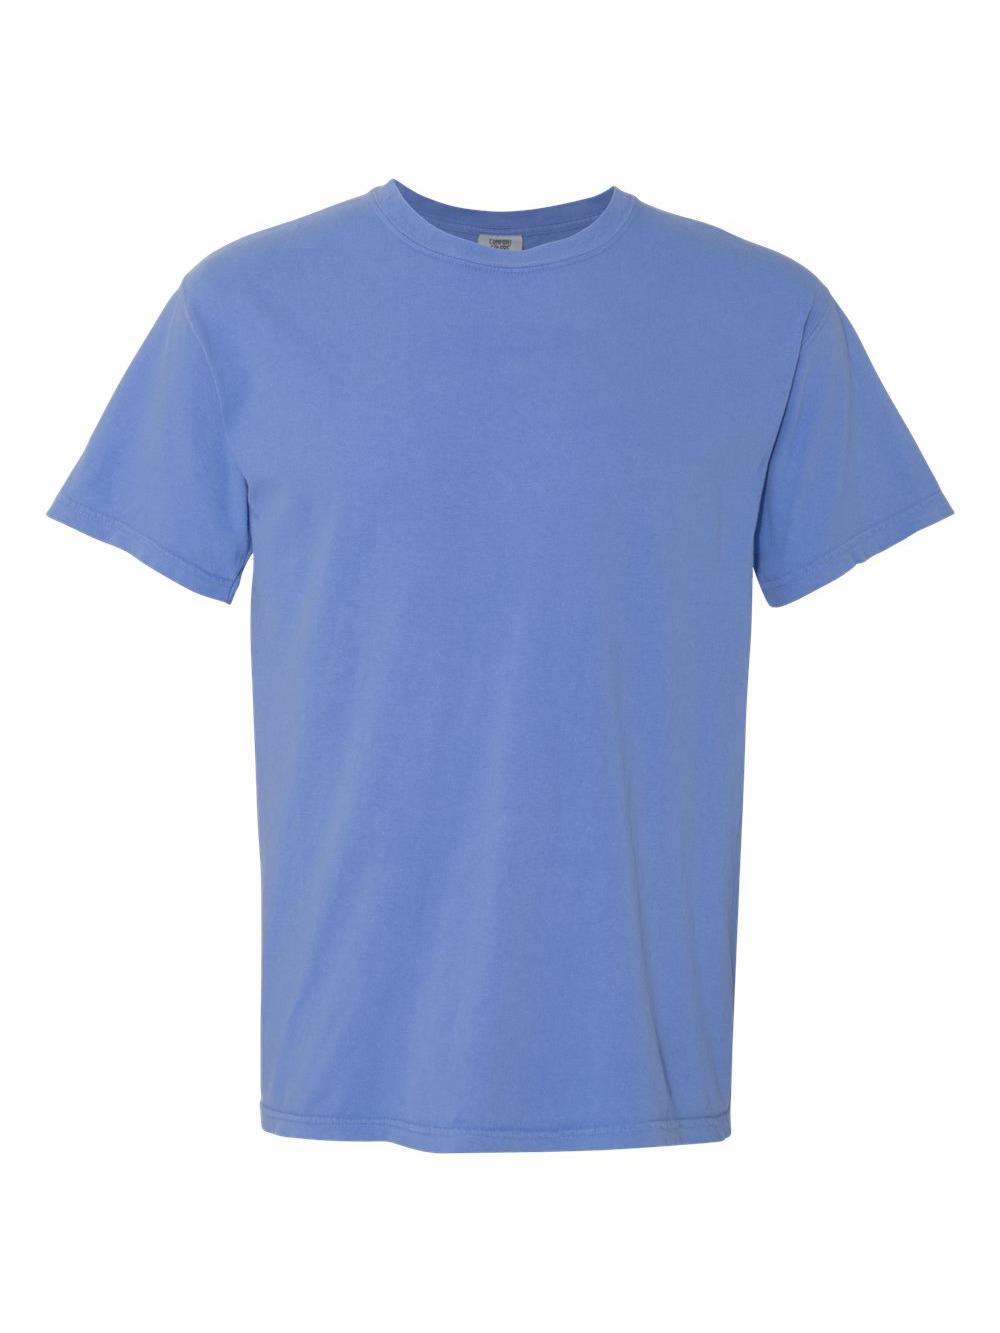 Comfort-Colors-Garment-Dyed-Heavyweight-Ringspun-Short-Sleeve-Shirt-1717 thumbnail 93